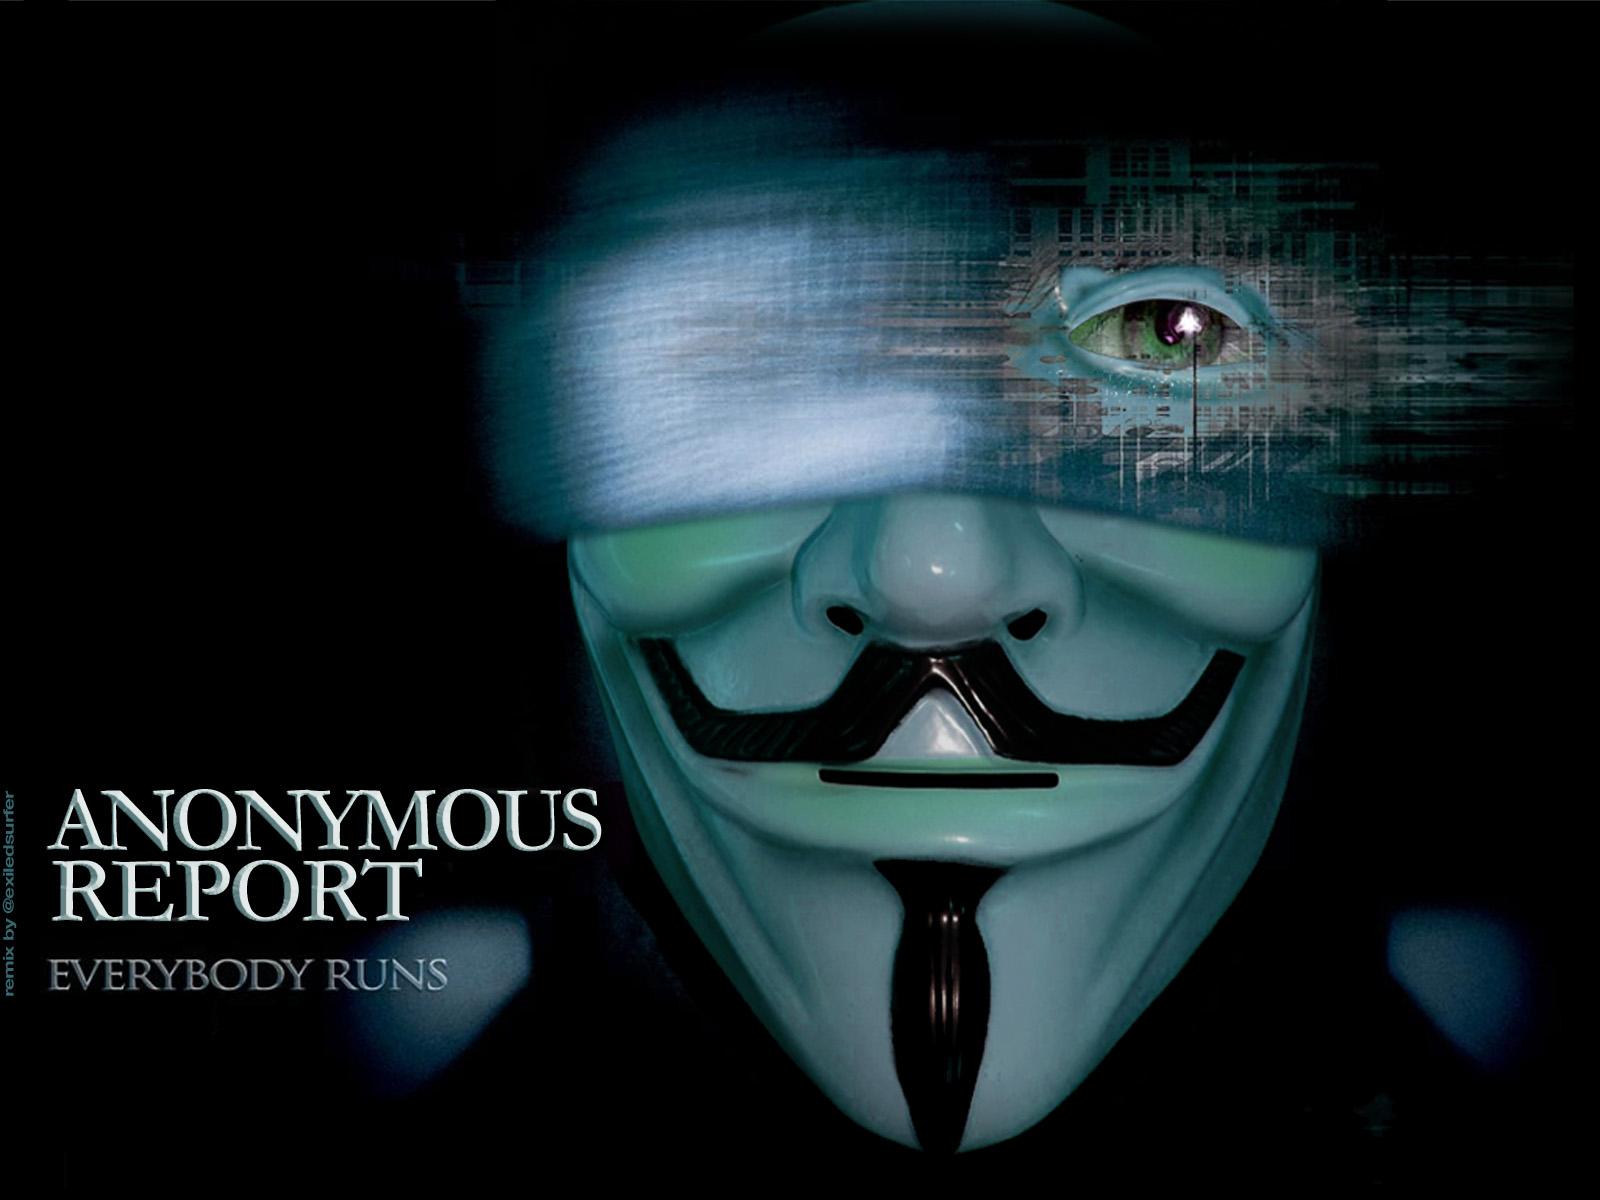 anonymous_report